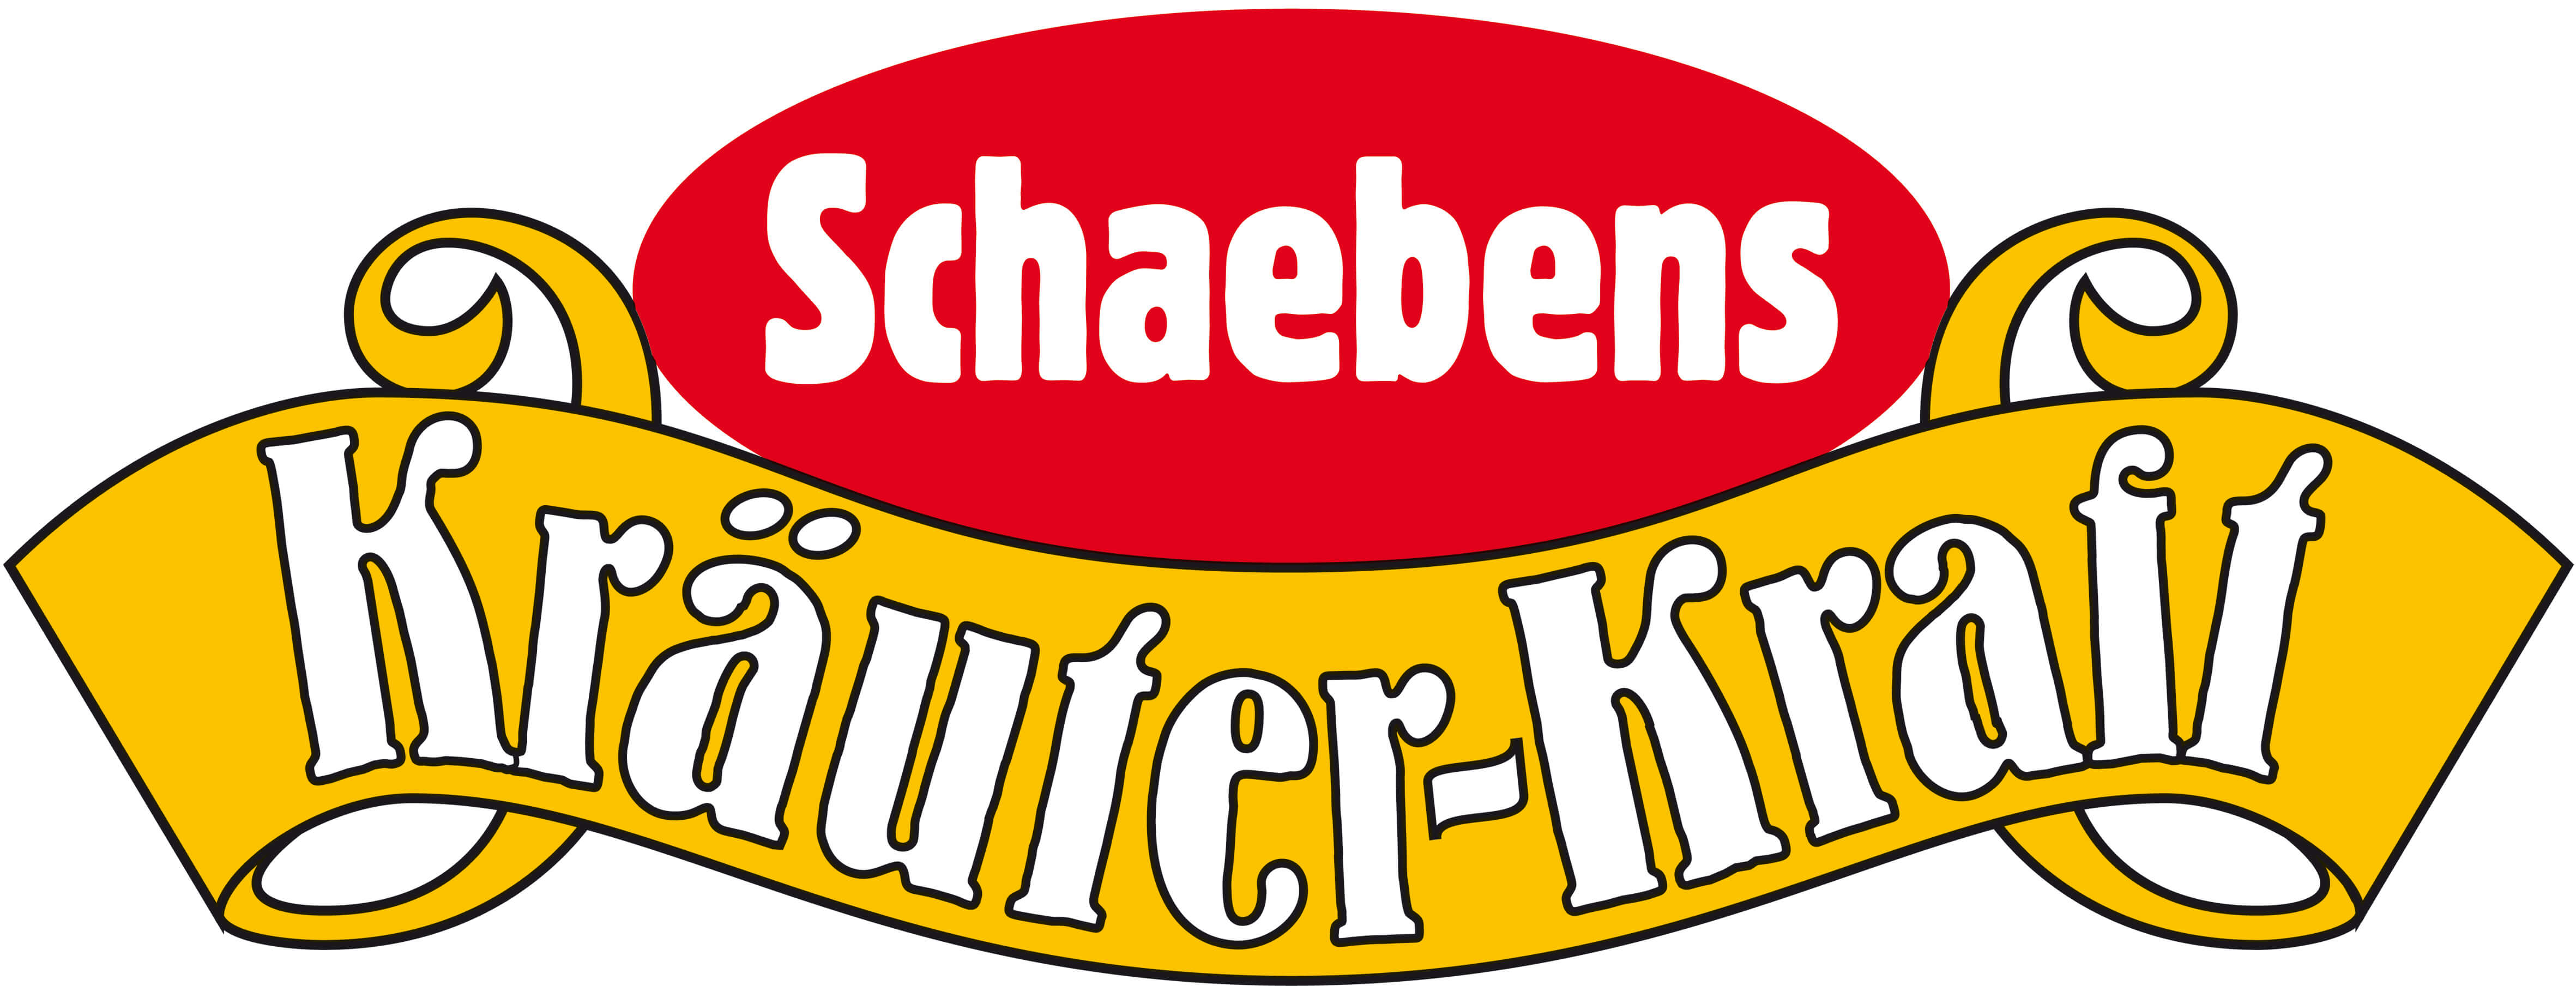 Schaebens-logo